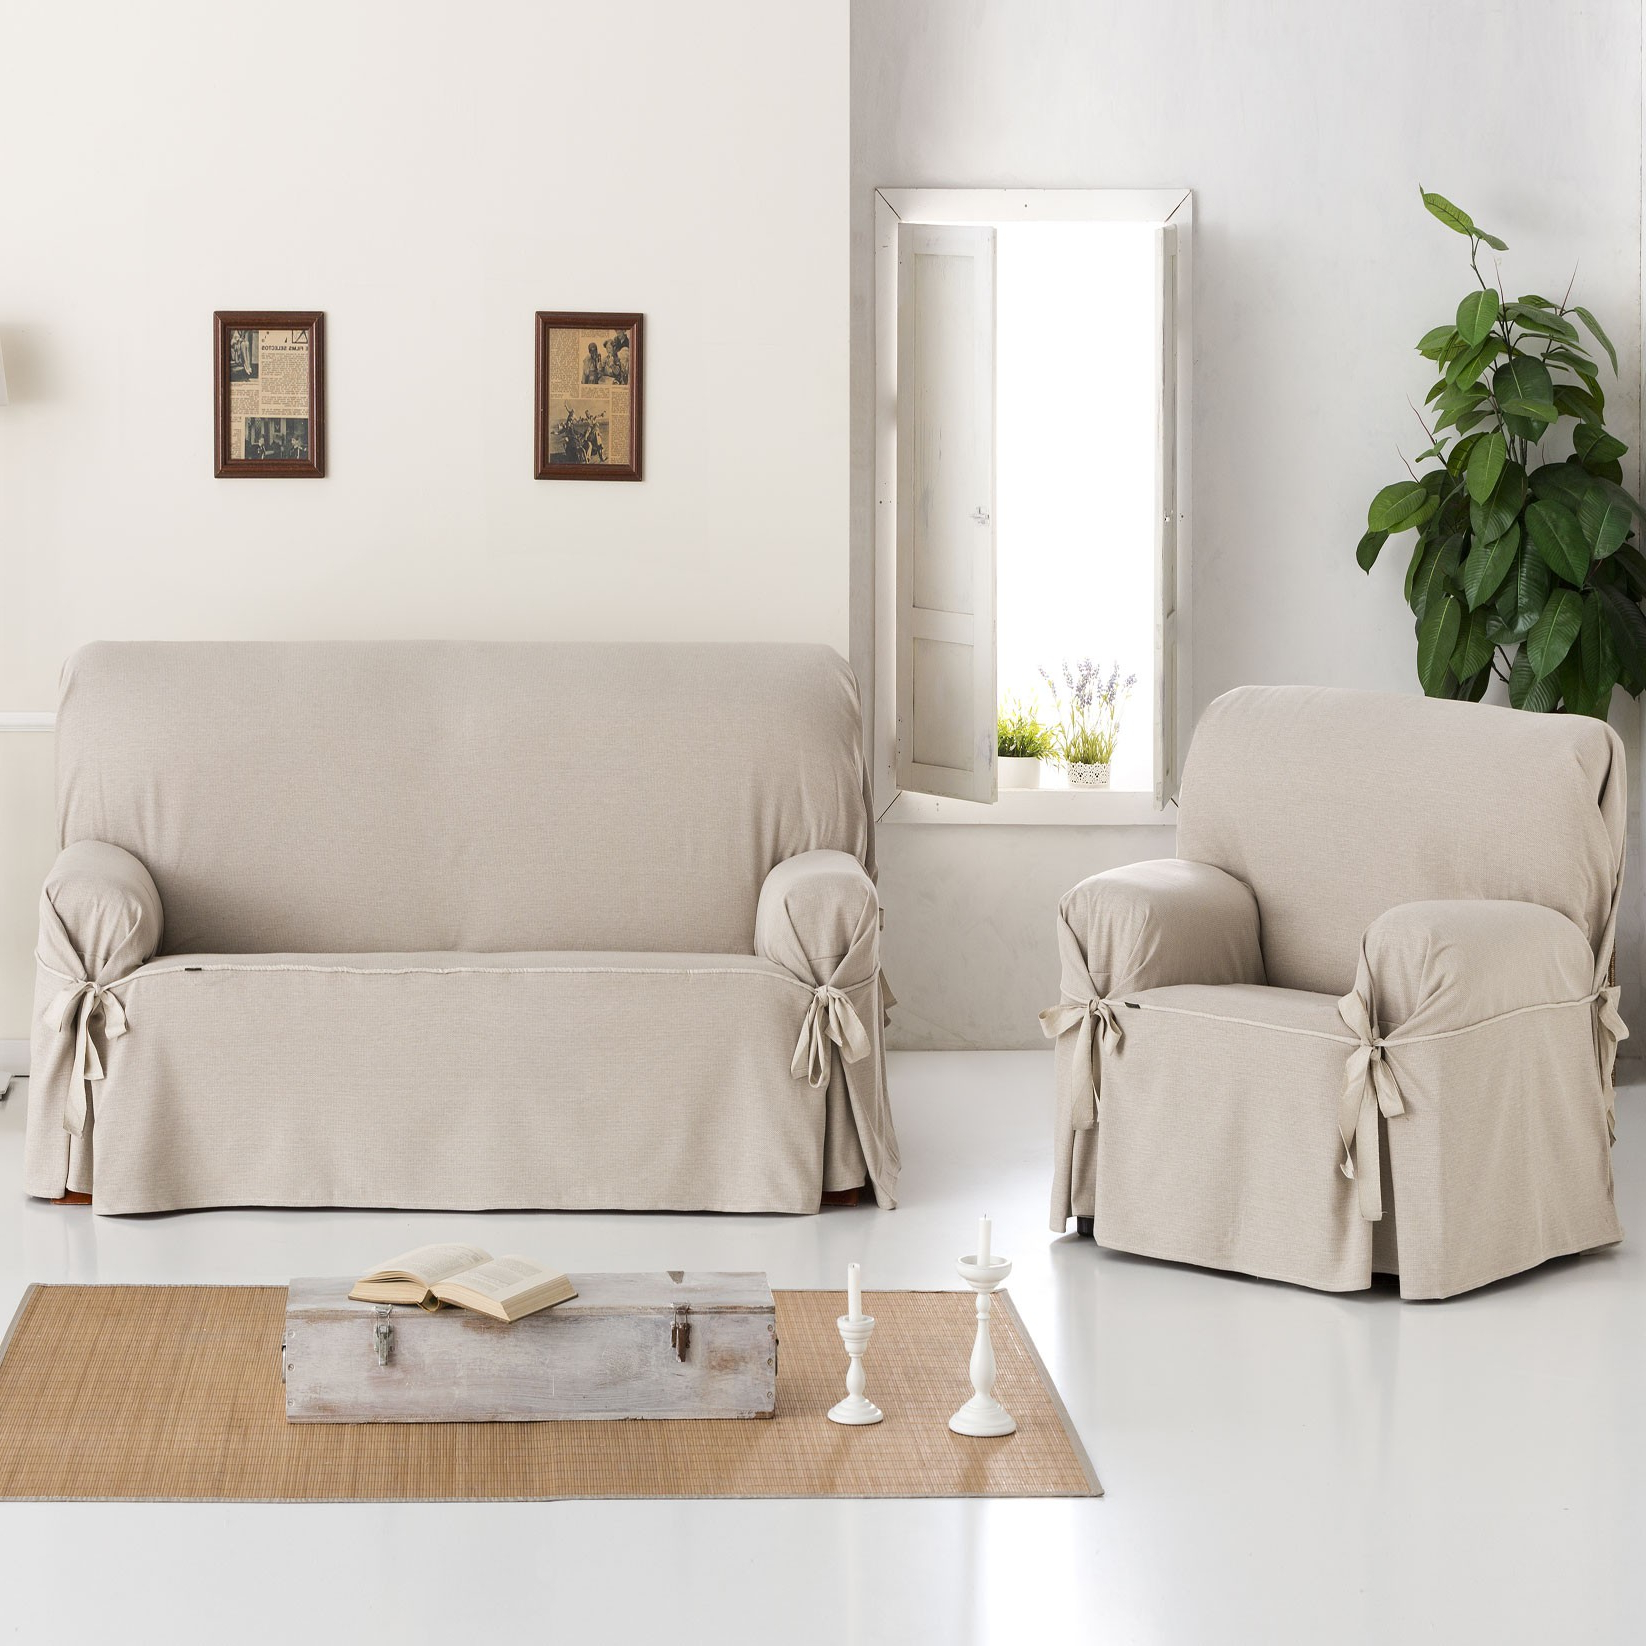 Funda De sofa Ftd8 Funda sofà Universal Constanza Lazos Lino